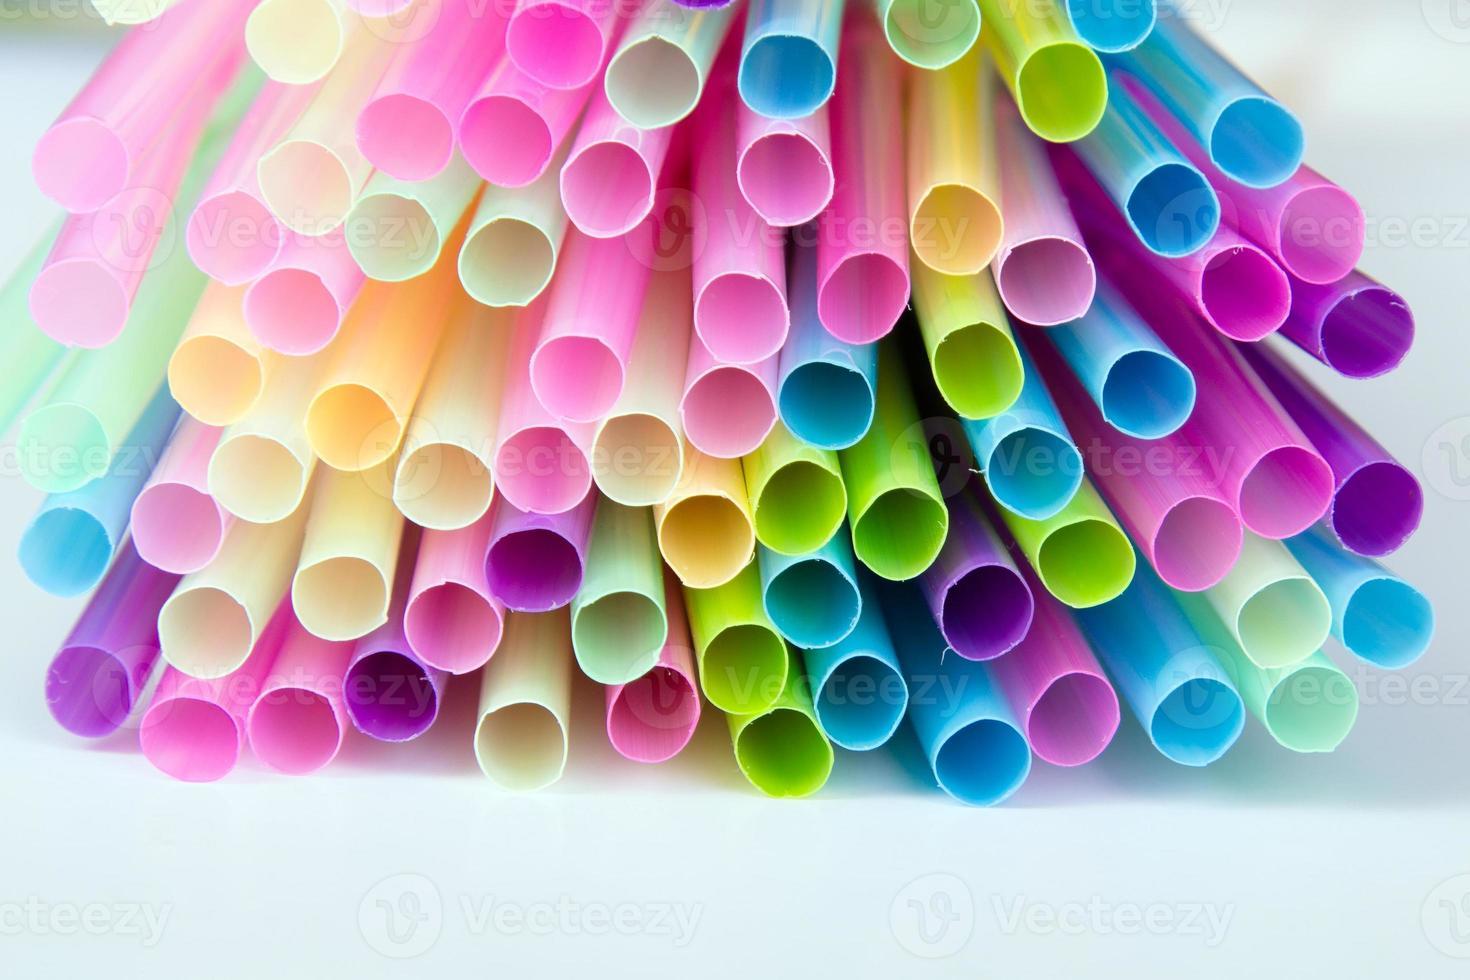 mehrfarbige Plastik-Trinkhalme foto